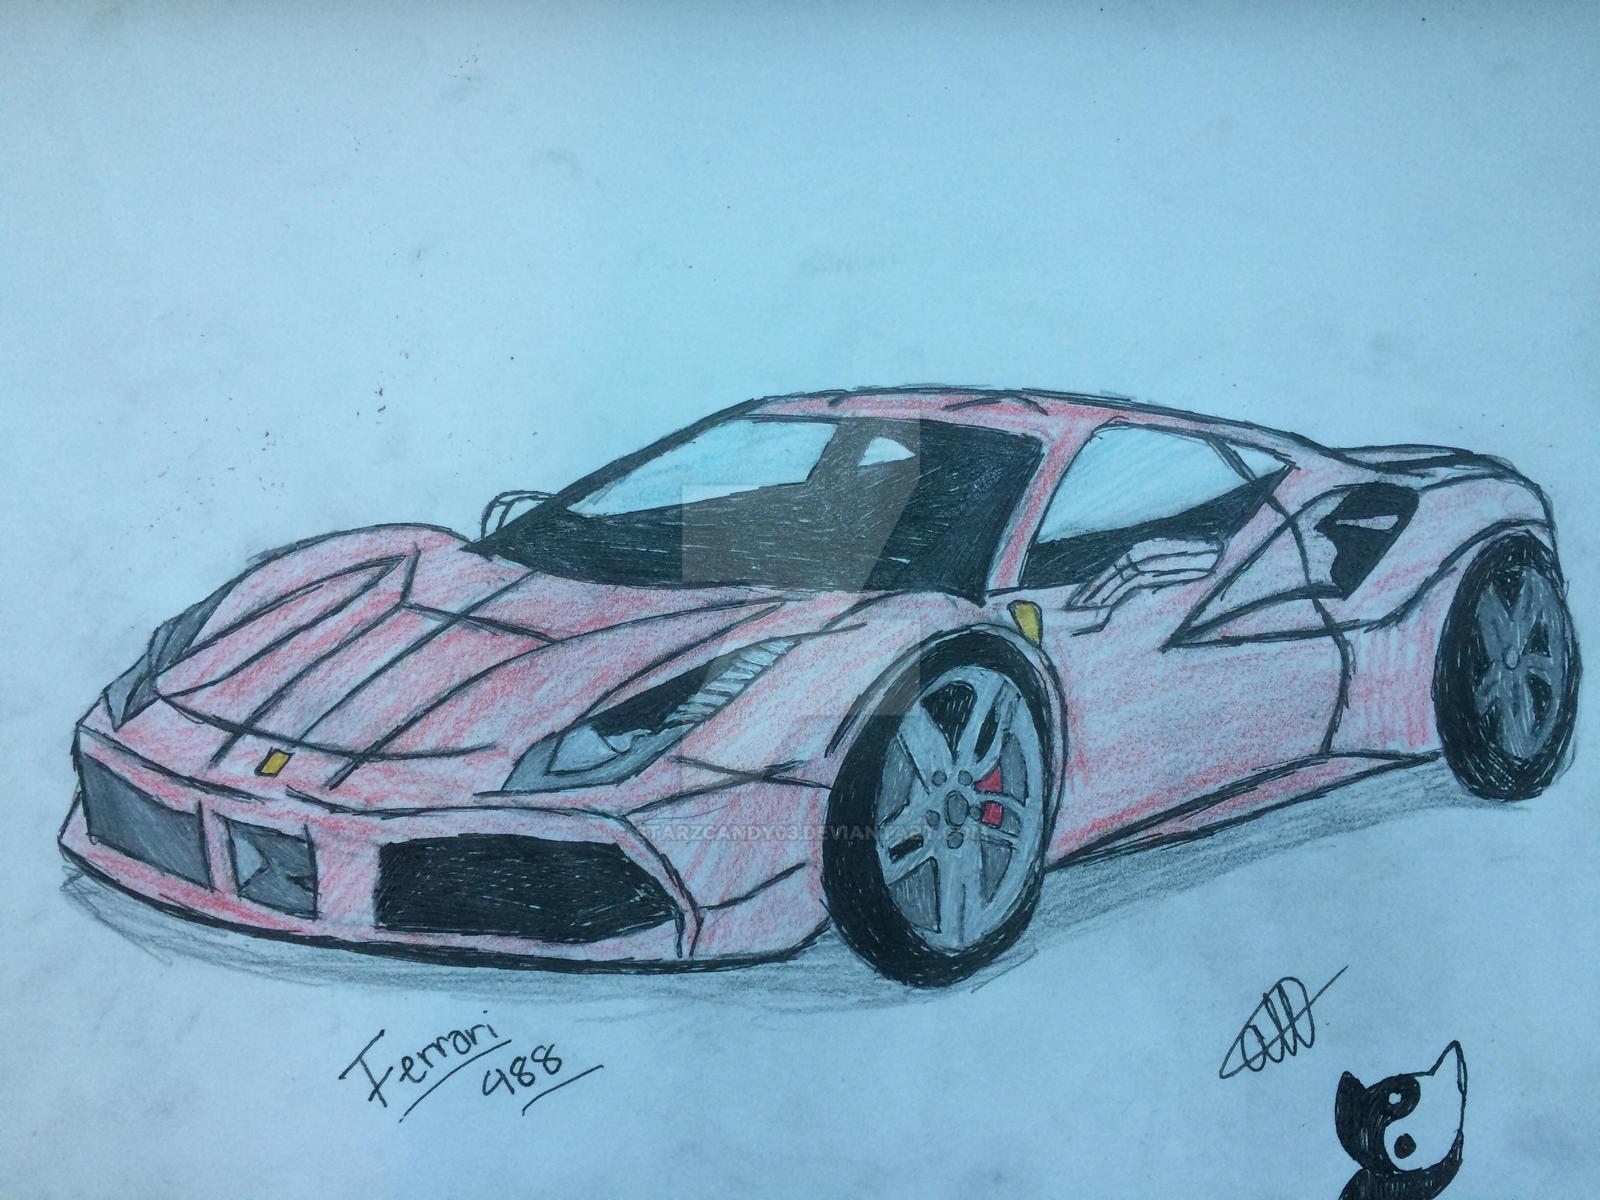 Ferrari488 (Re lighting) by StarZCandy03